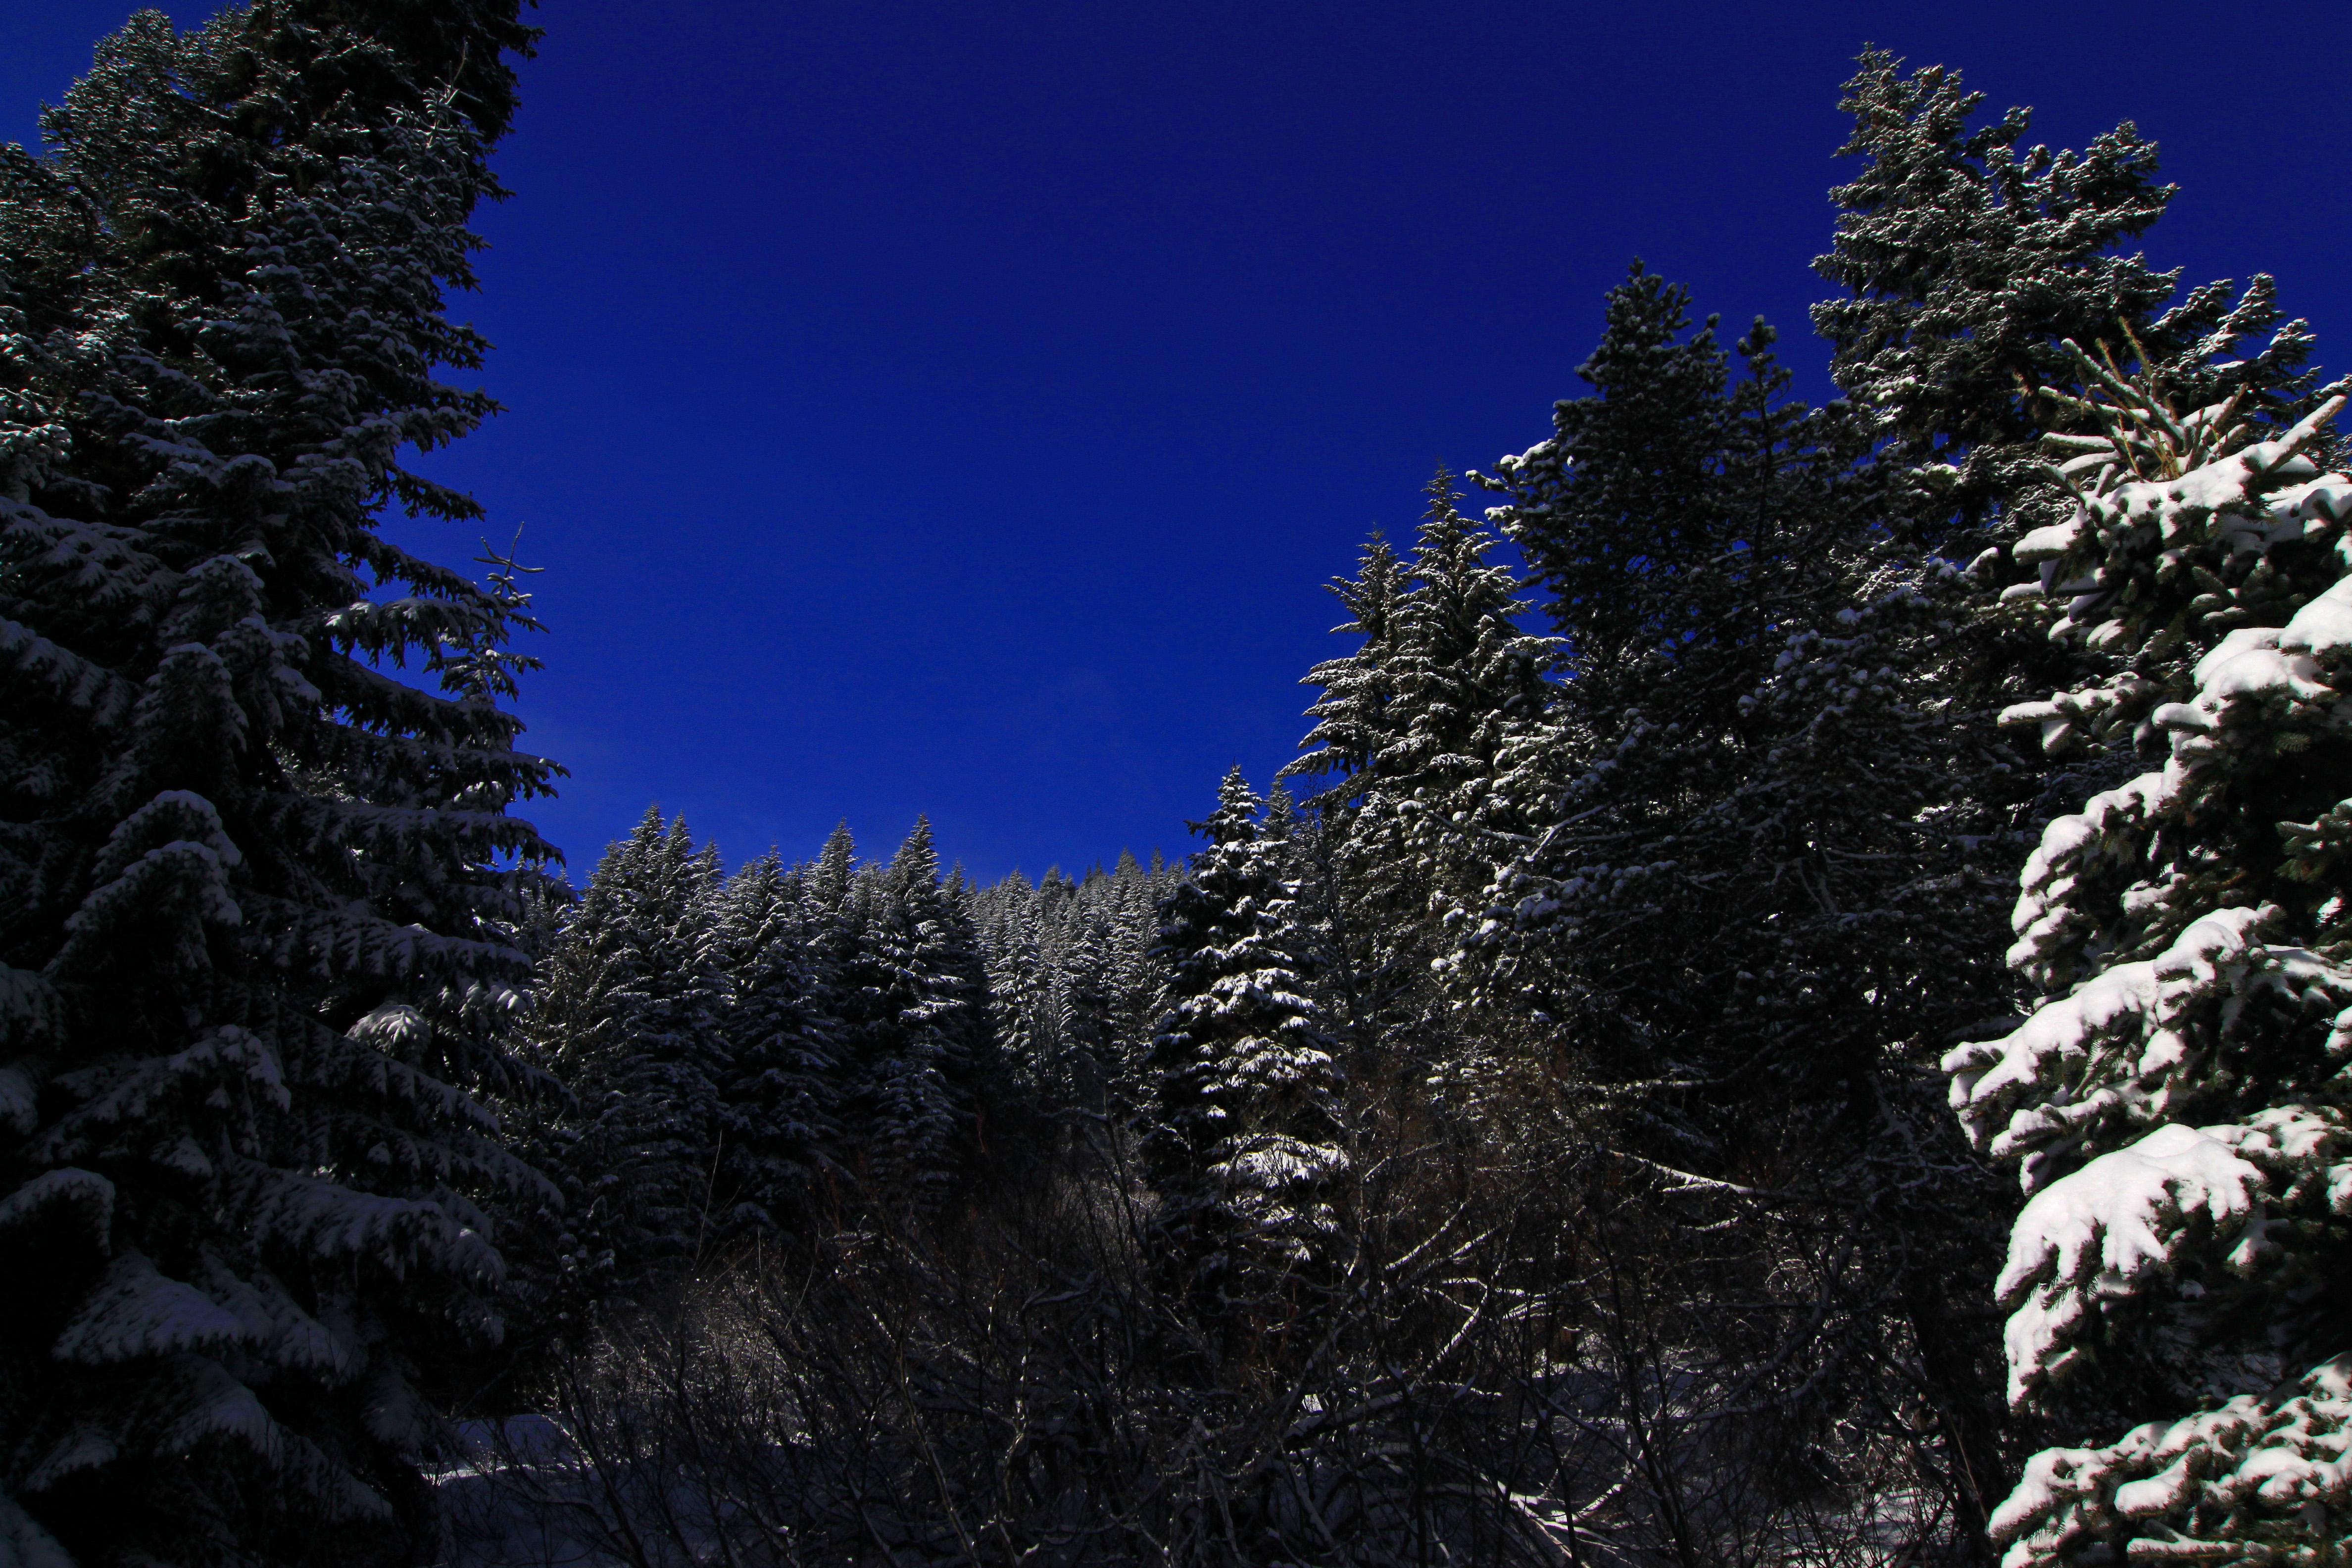 Still sunny in the Cascades